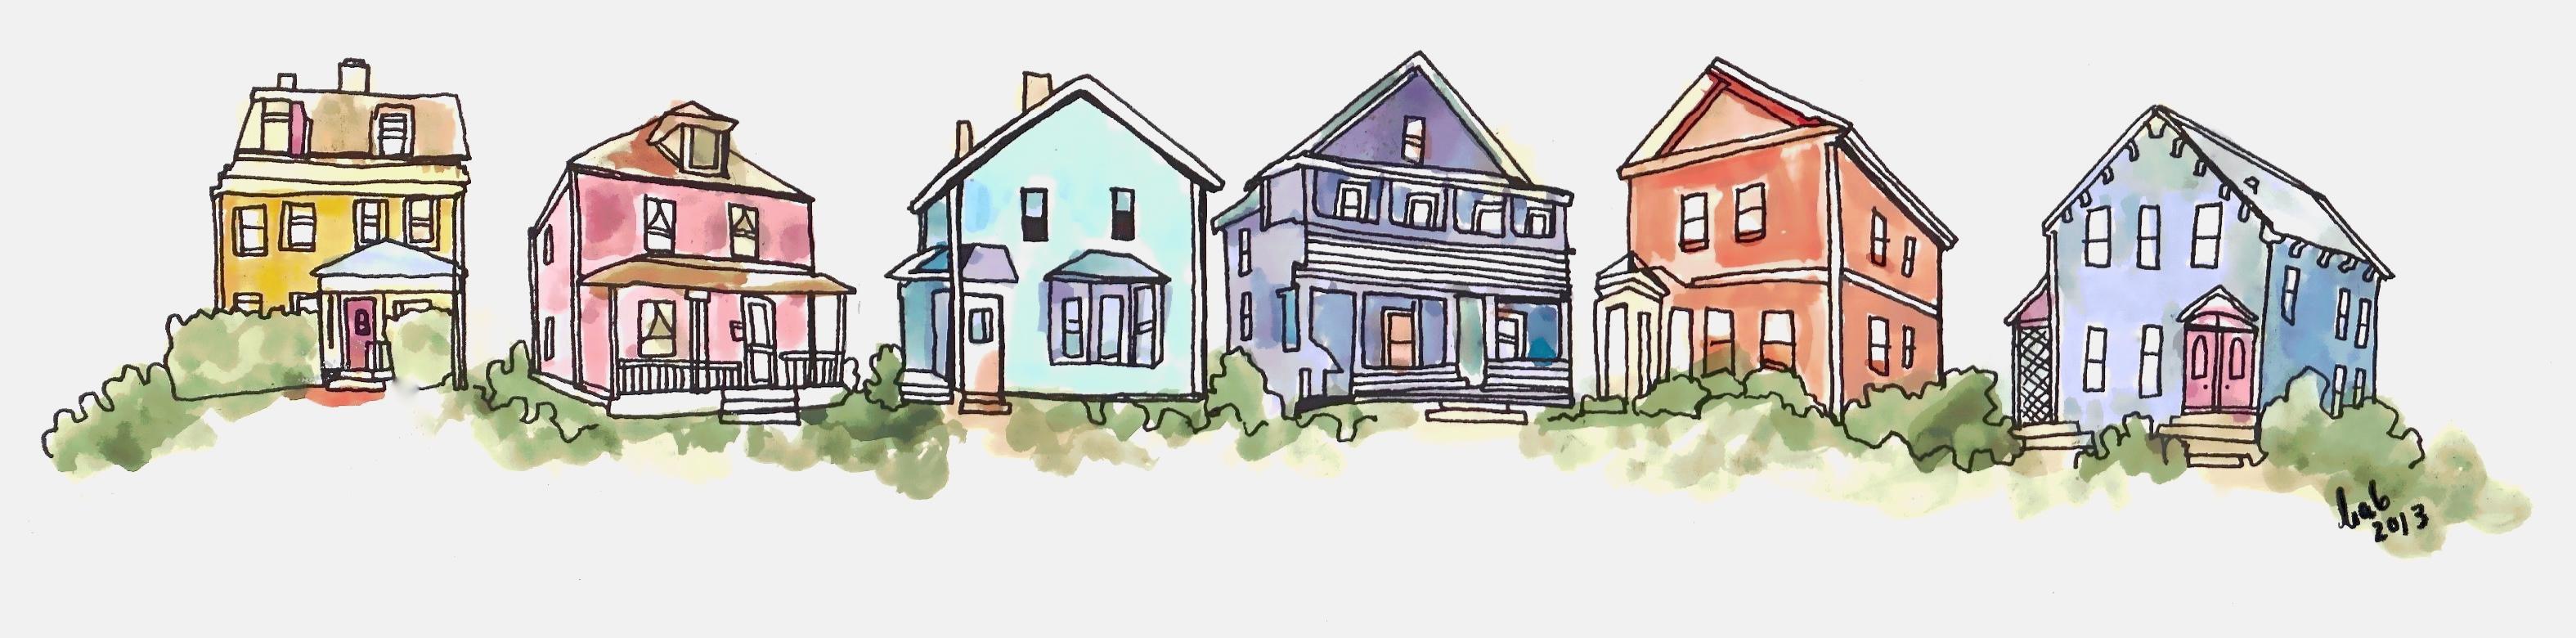 Haley Bishop houses